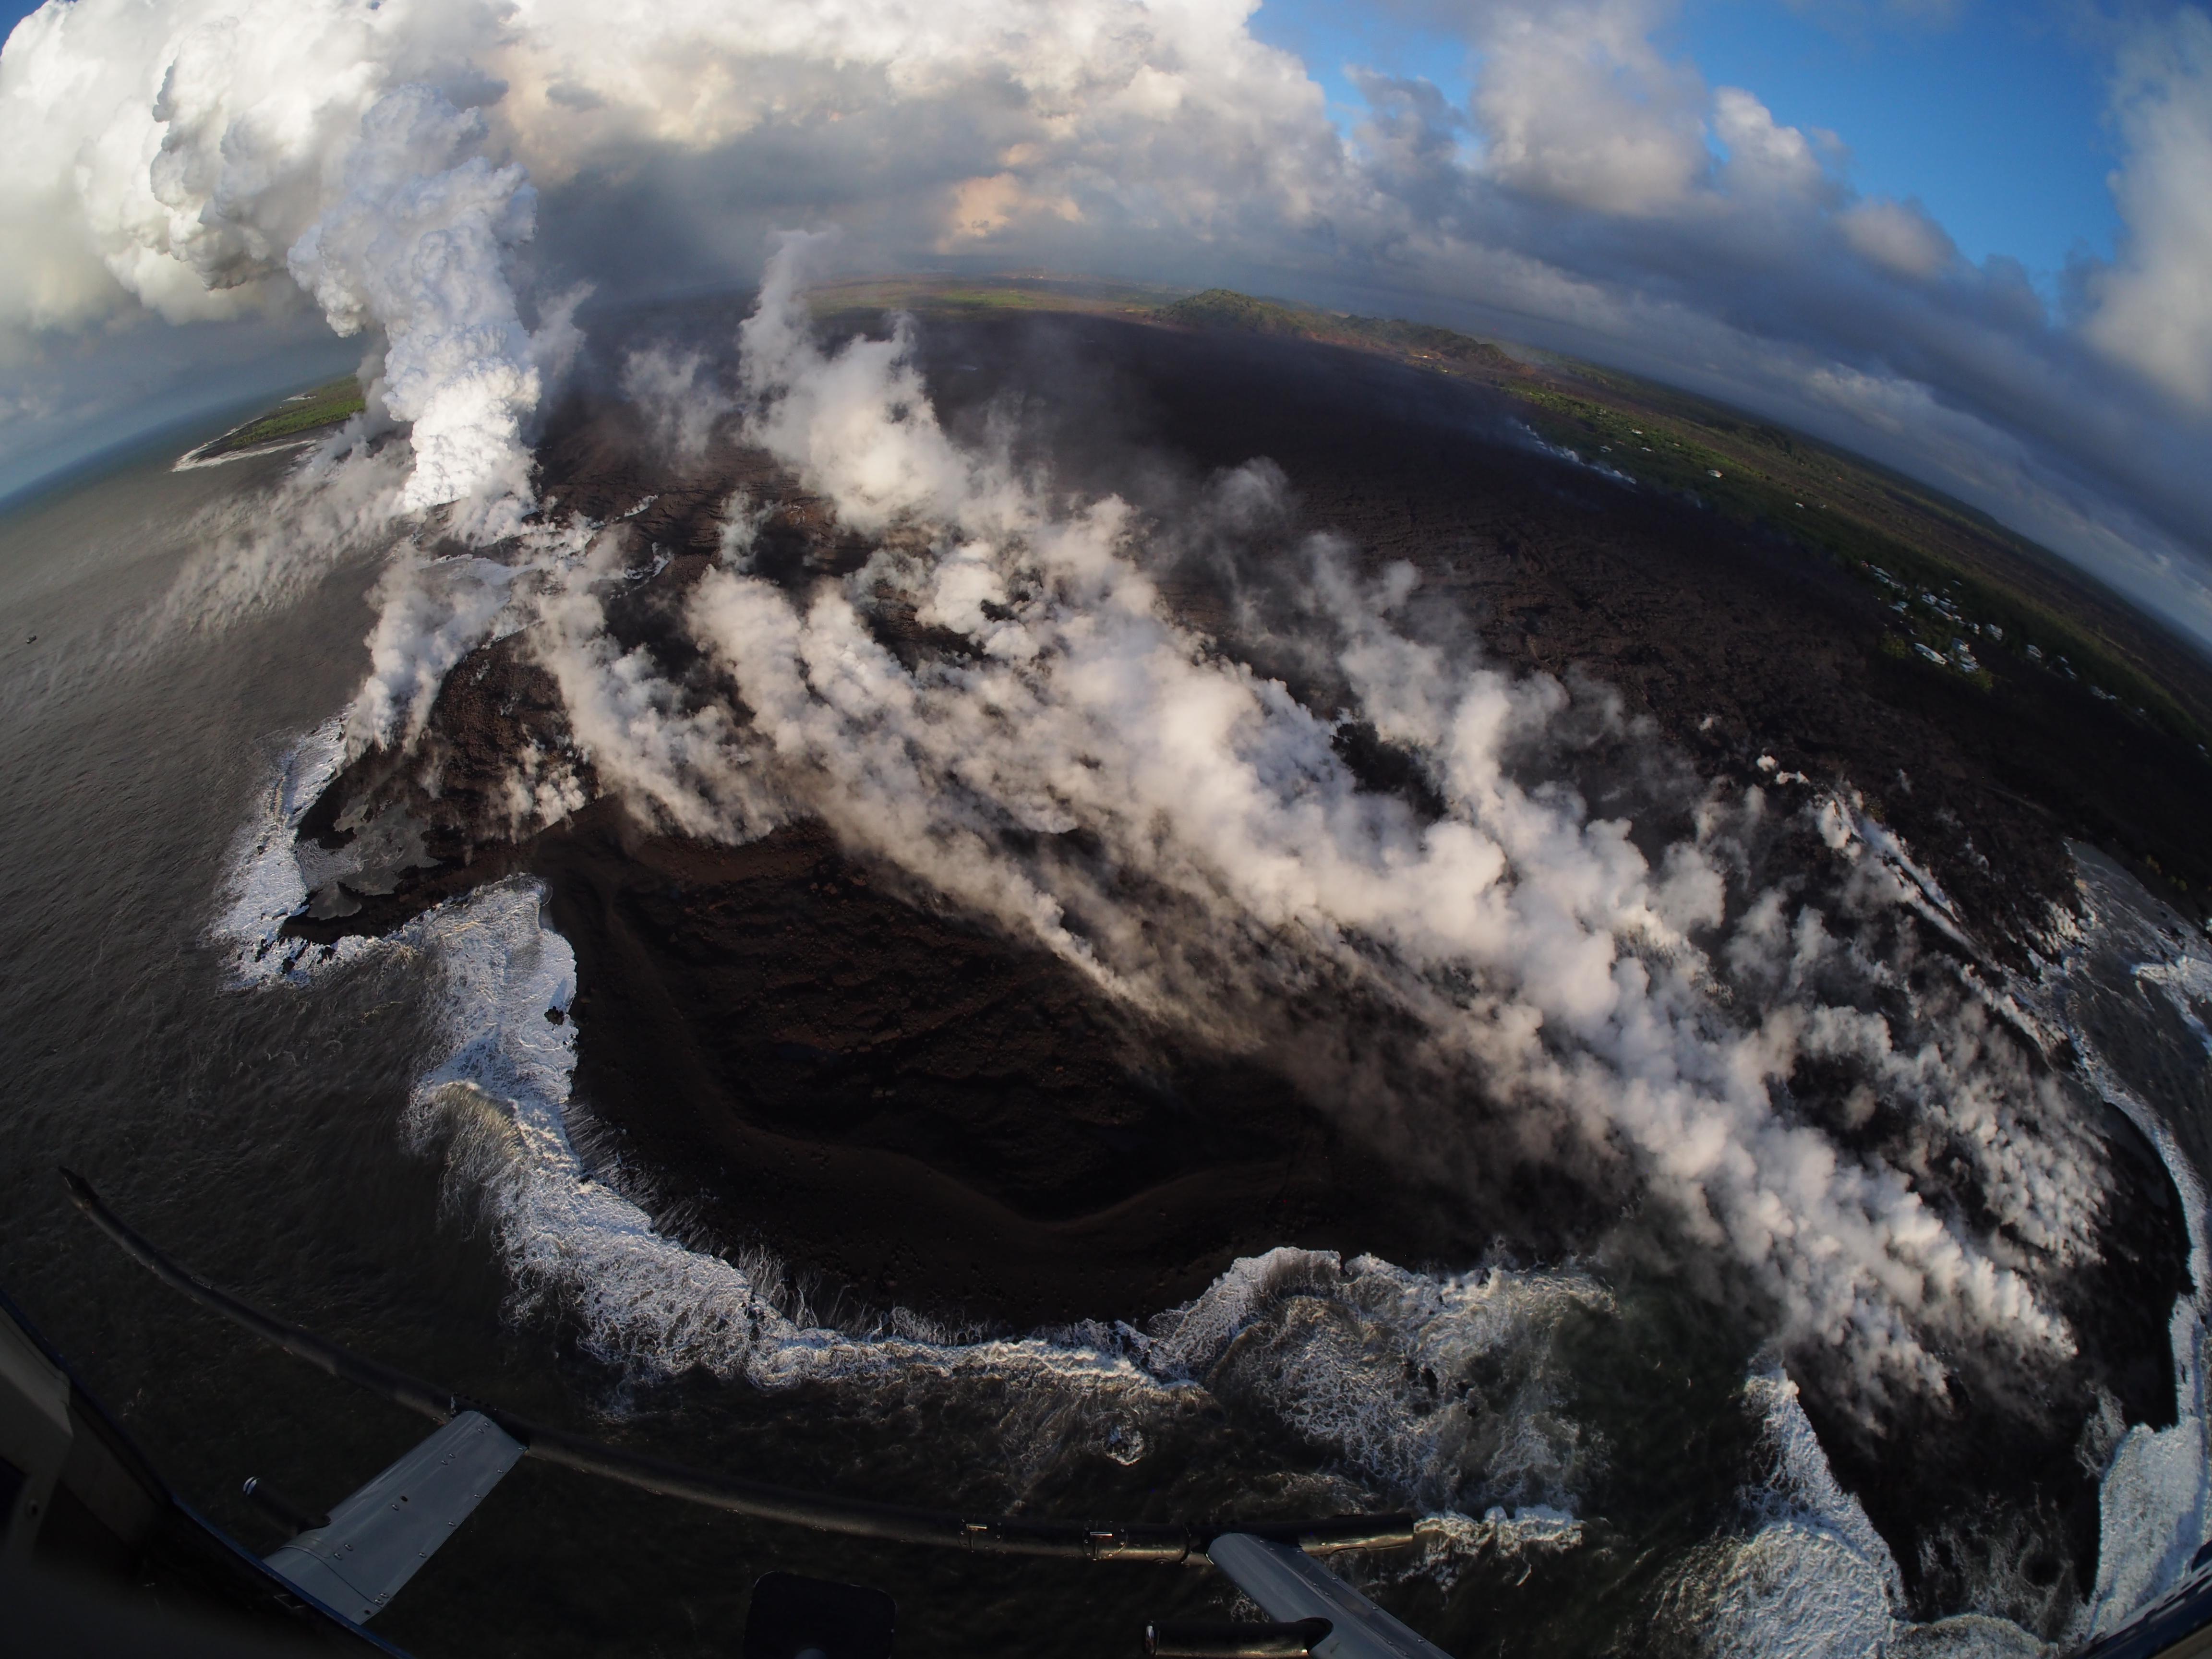 Lava flow from Hawaii volcano engulfs neighborhood, creates new land